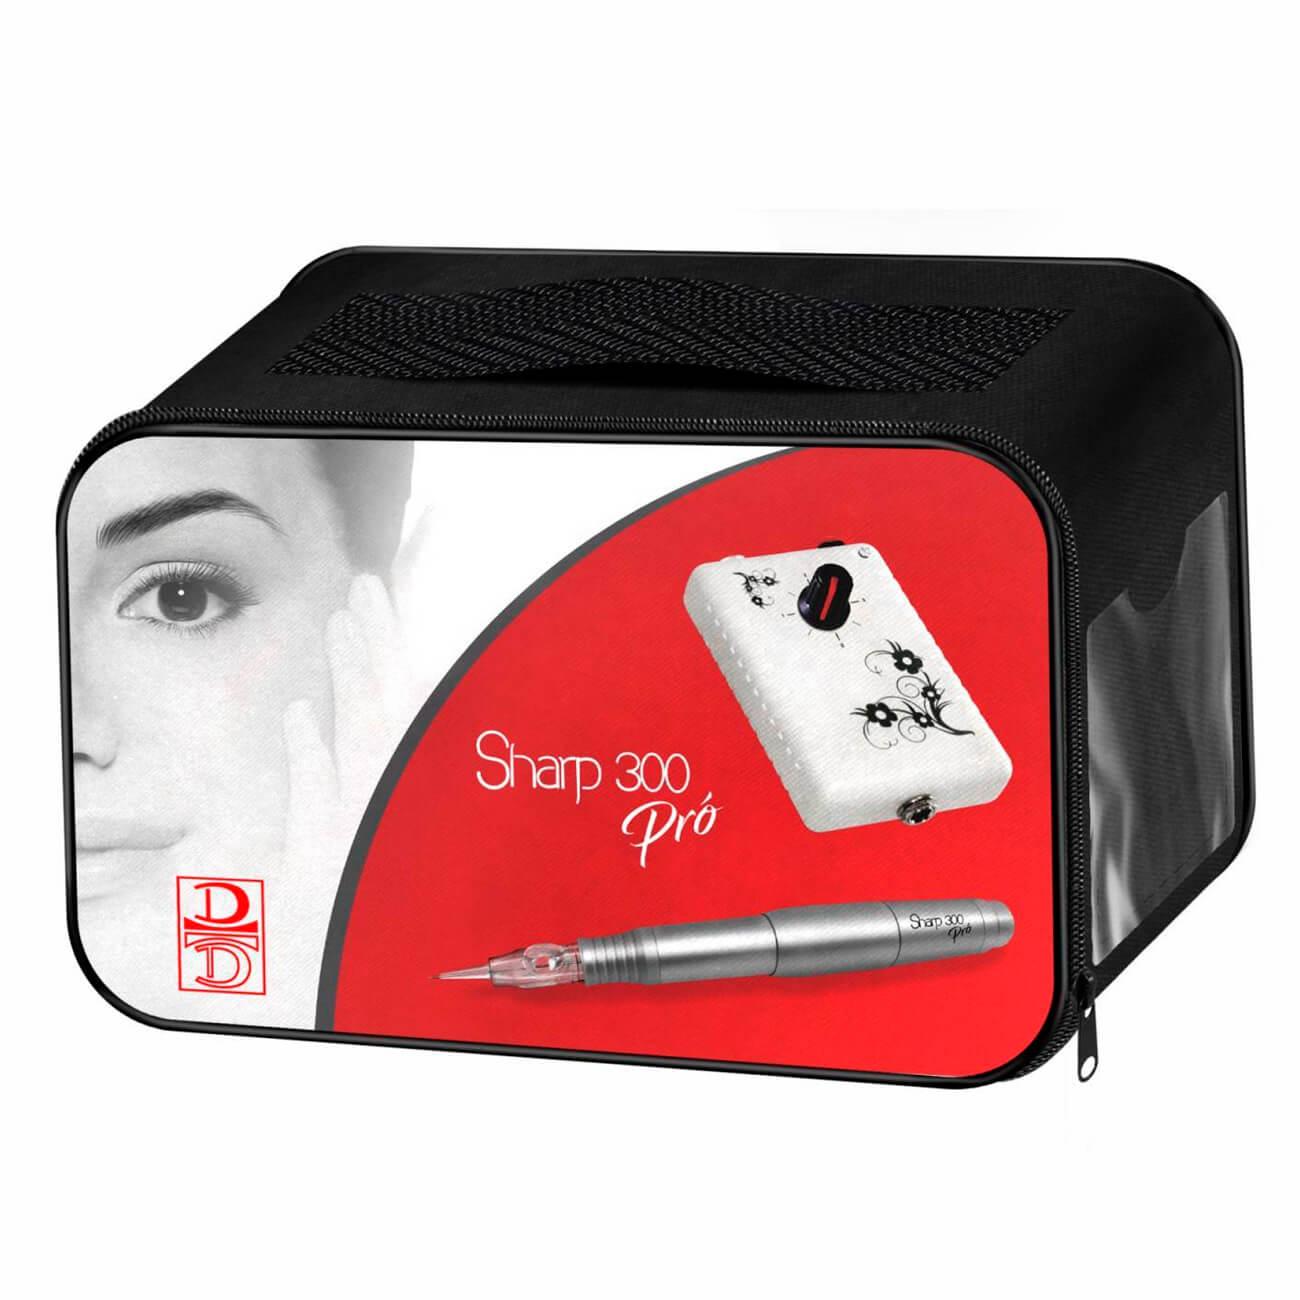 Conjunto Controle Analógico + Dermógrafo Sharp 300 Pró Preto